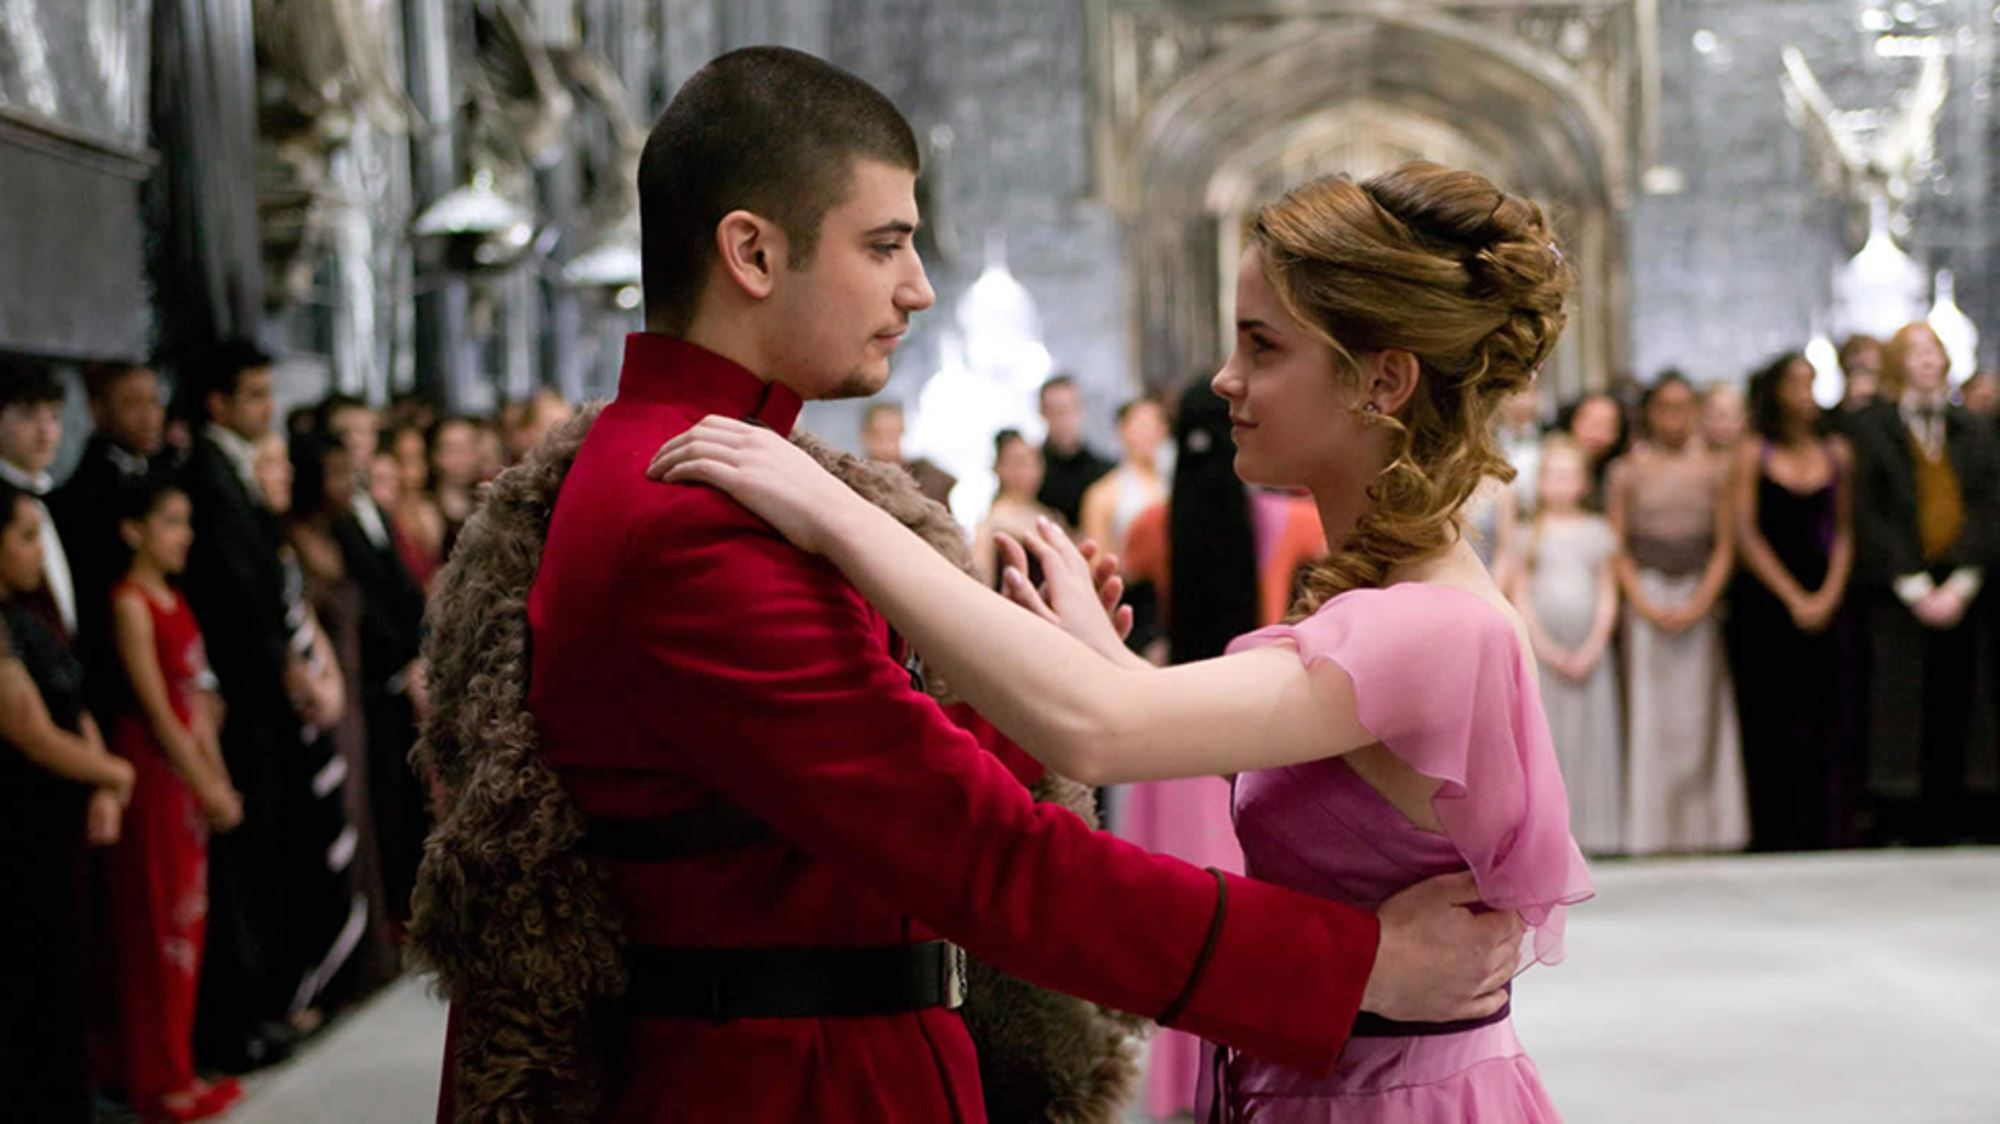 Hermione granger dating